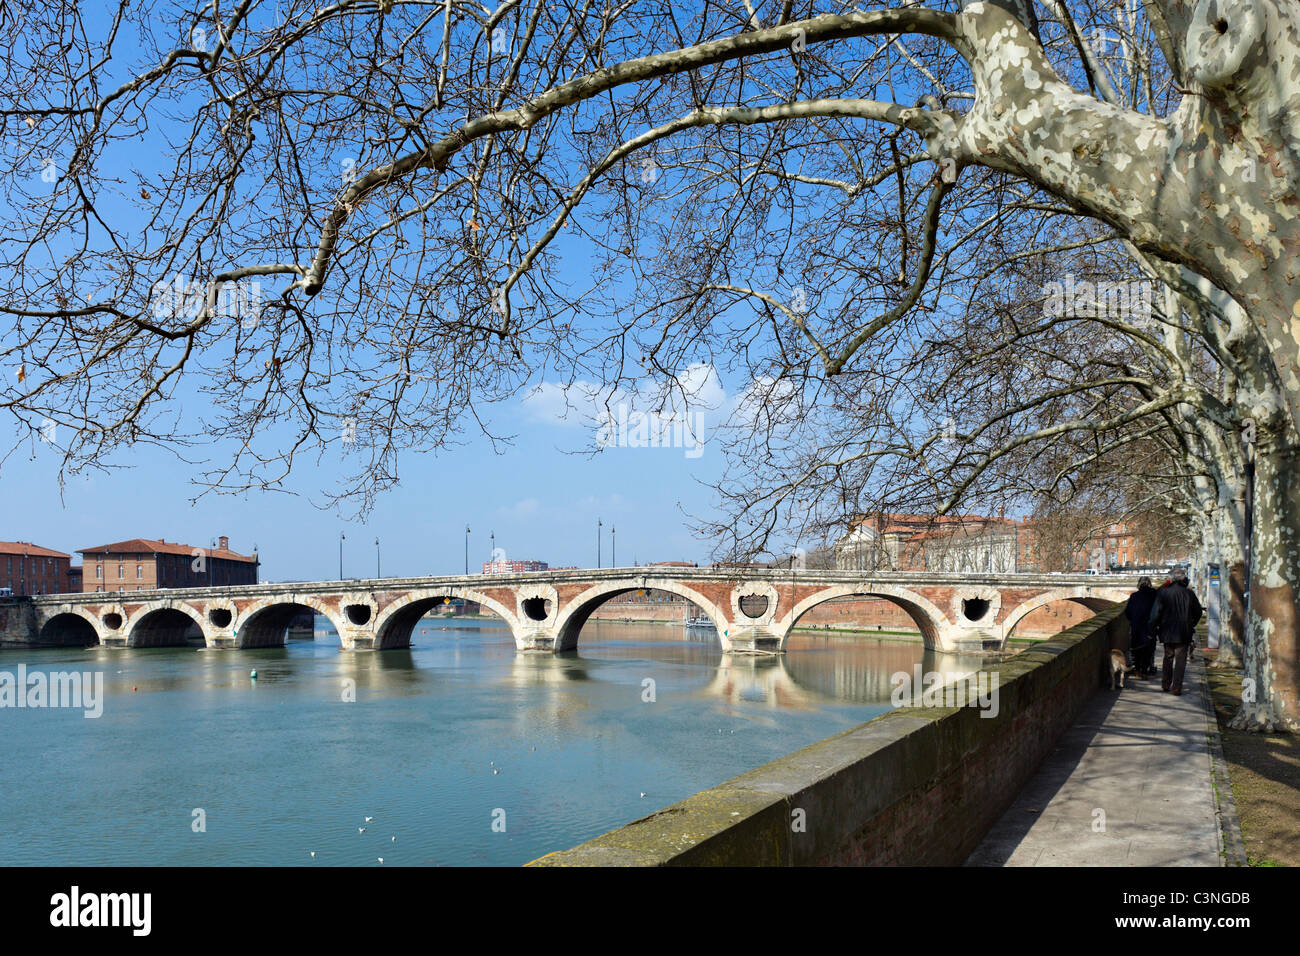 The banks of the River Garonne and the 16thC Pont Neuf bridge, Toulouse, Haute Garonne, Midi Pyrenees, France - Stock Image